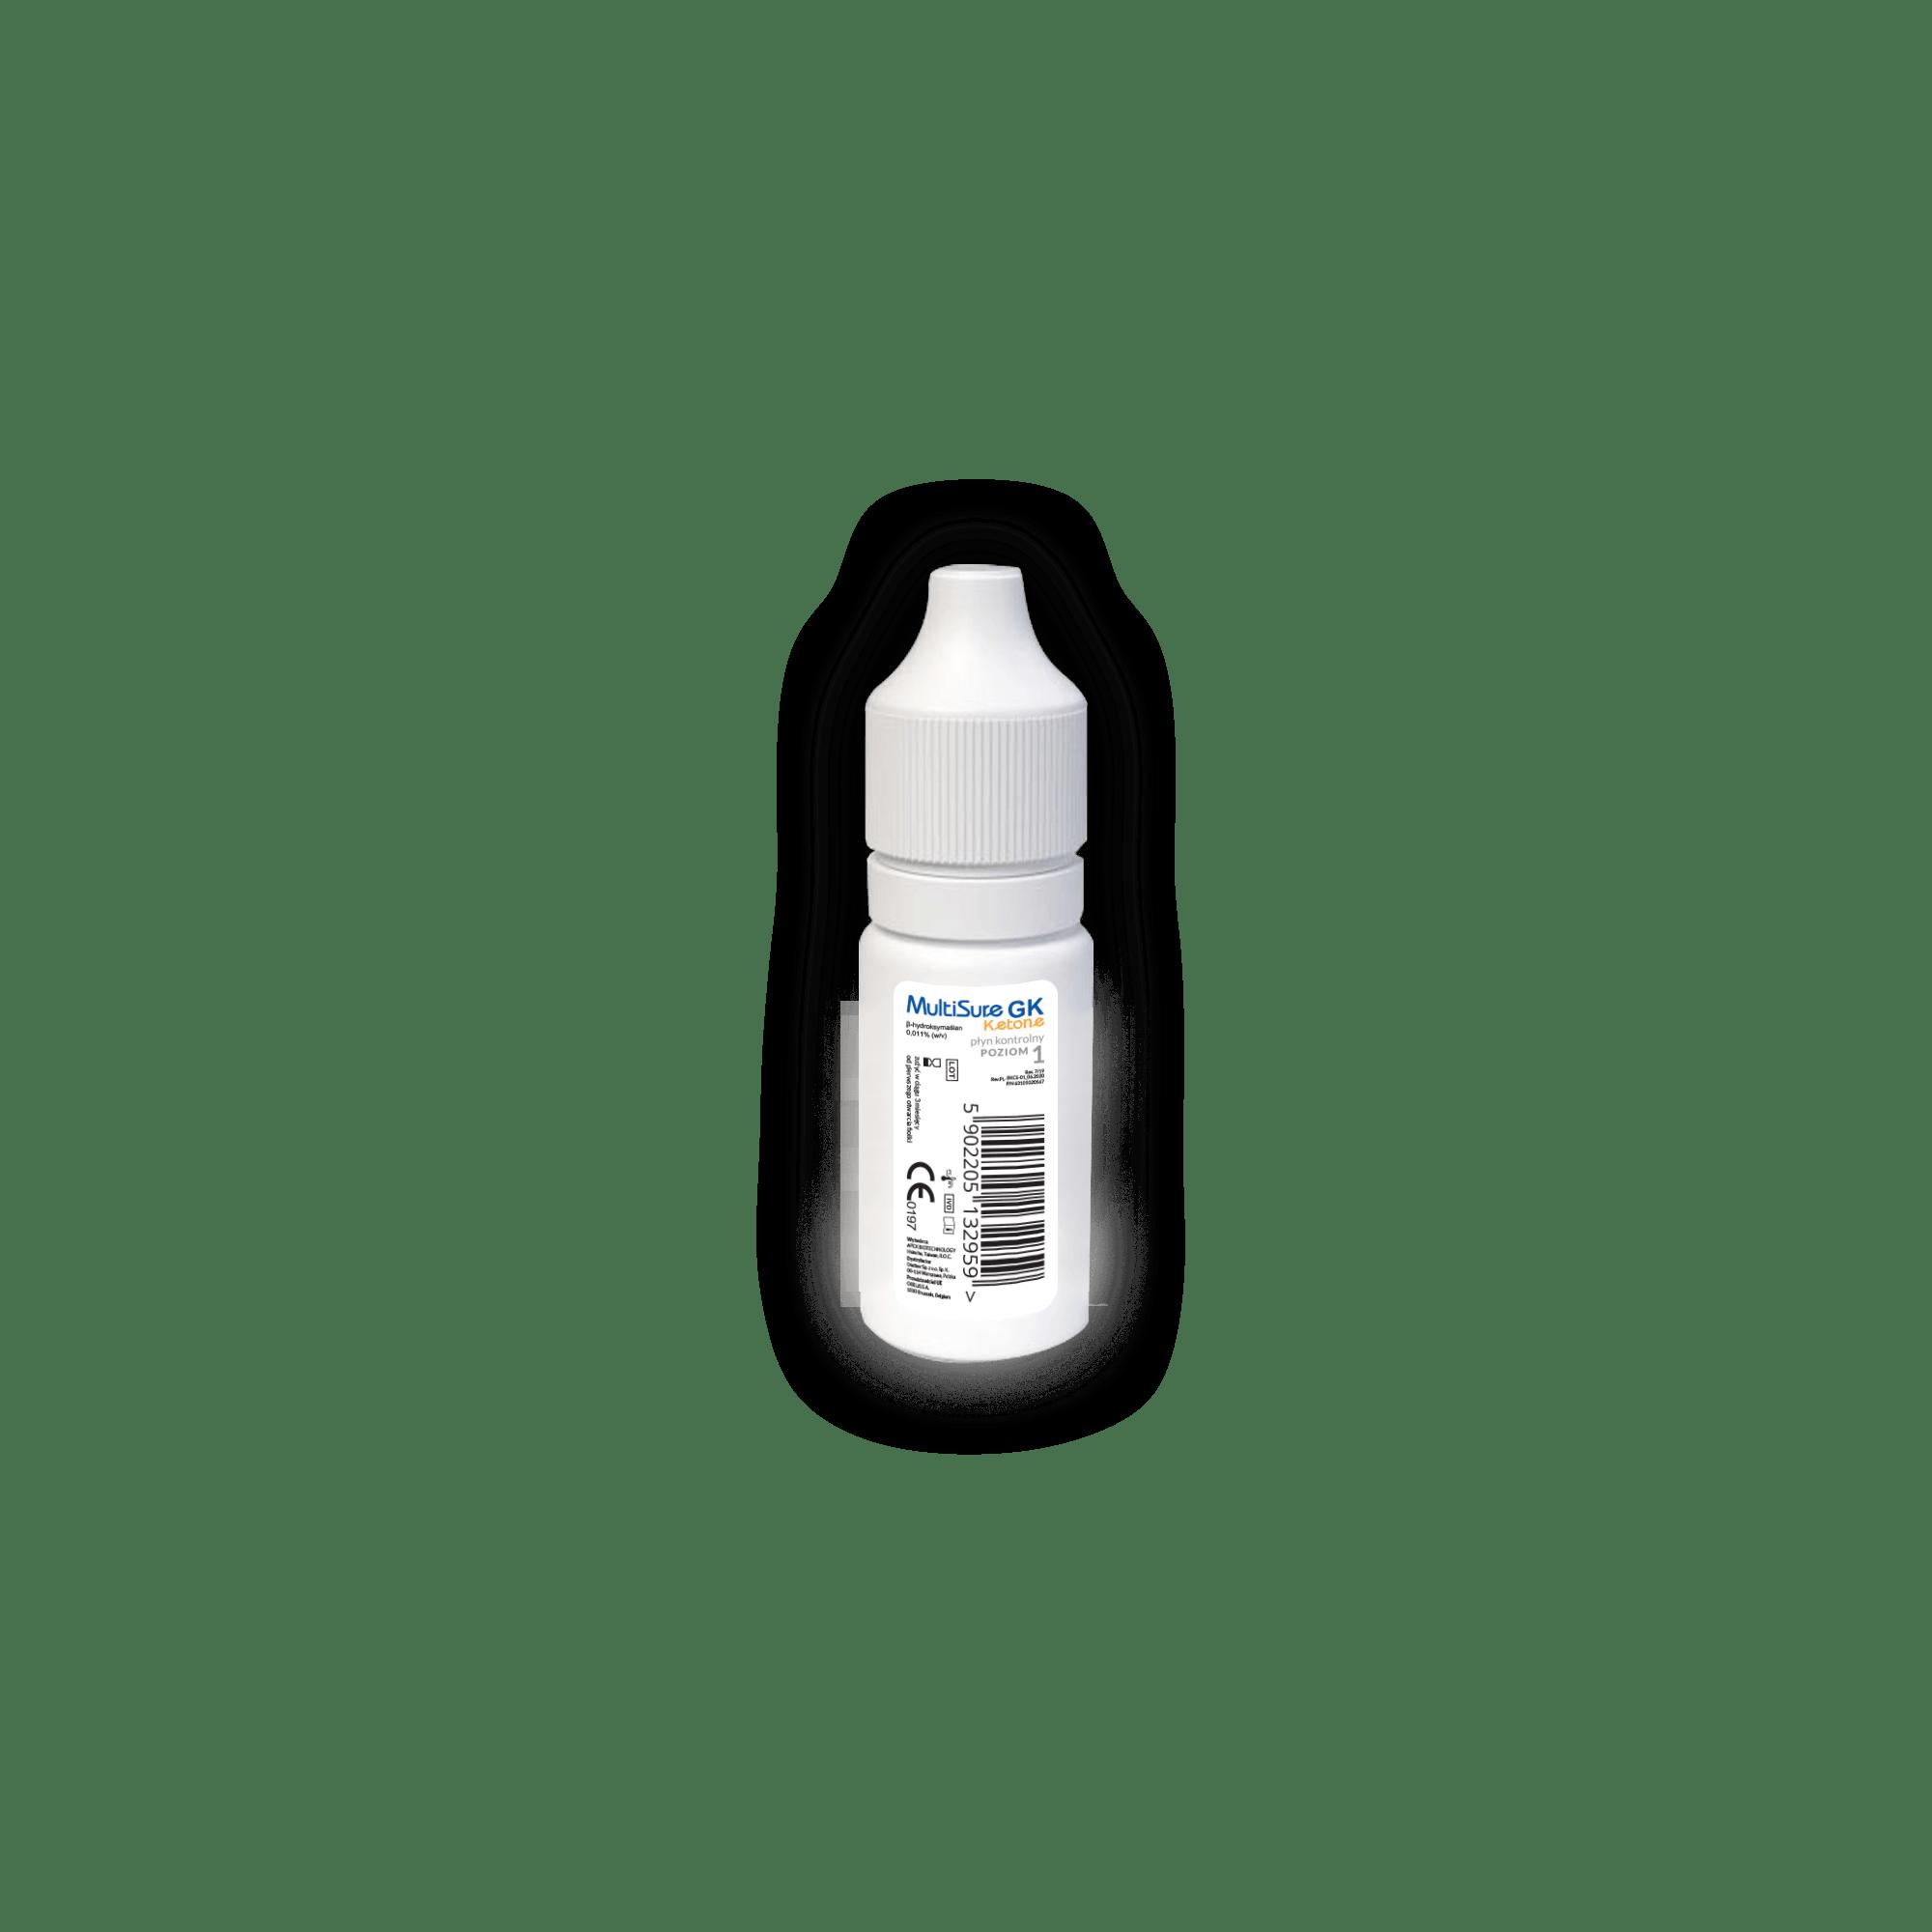 MultiSure GK Ketone płyn kontrolny